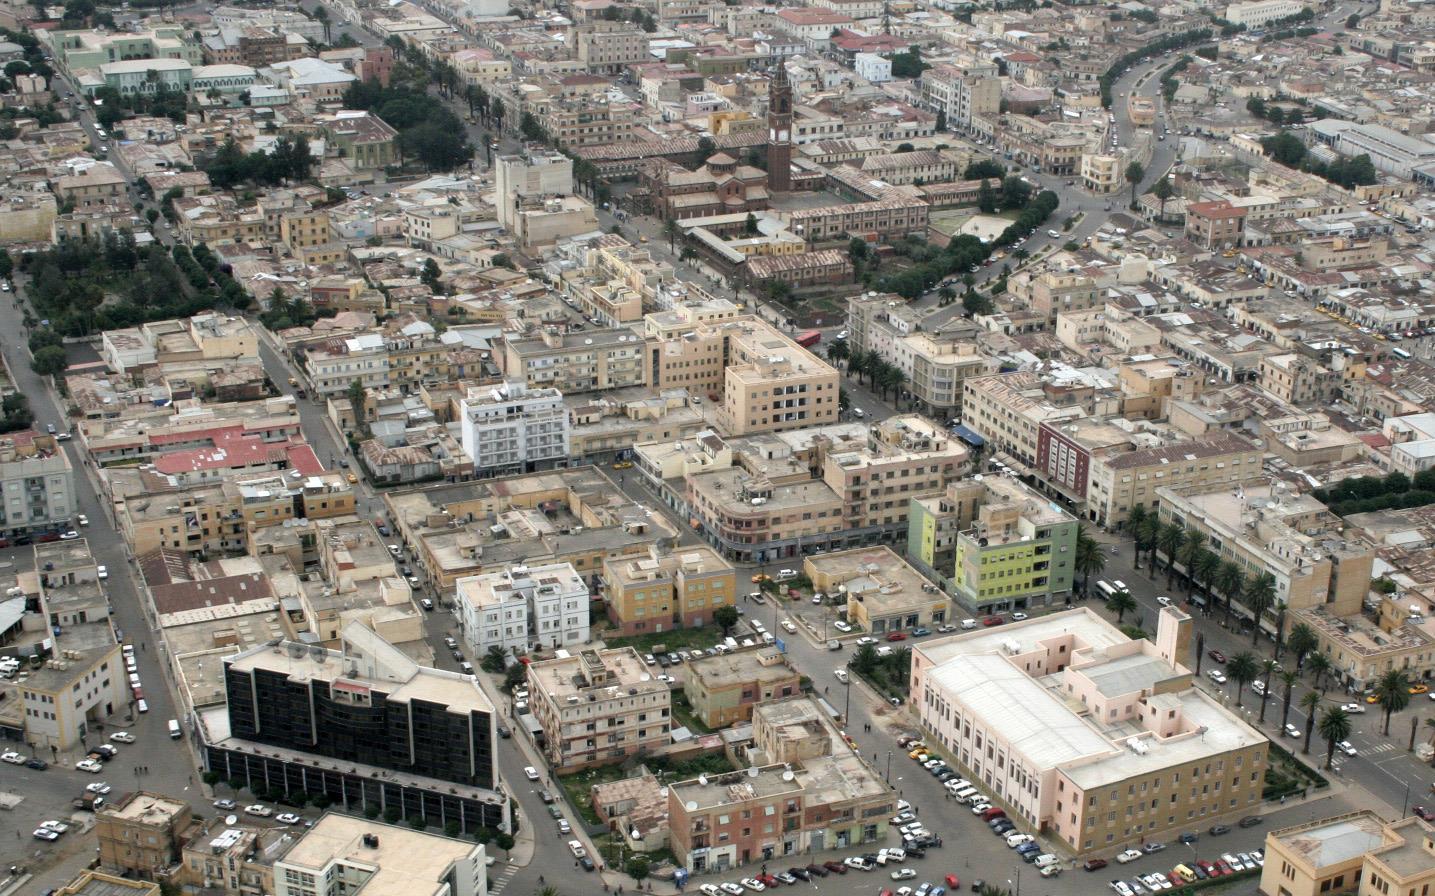 <Asmara: Africa&rsquo;s Modernist City (UNESCO World Heritage Inscription)